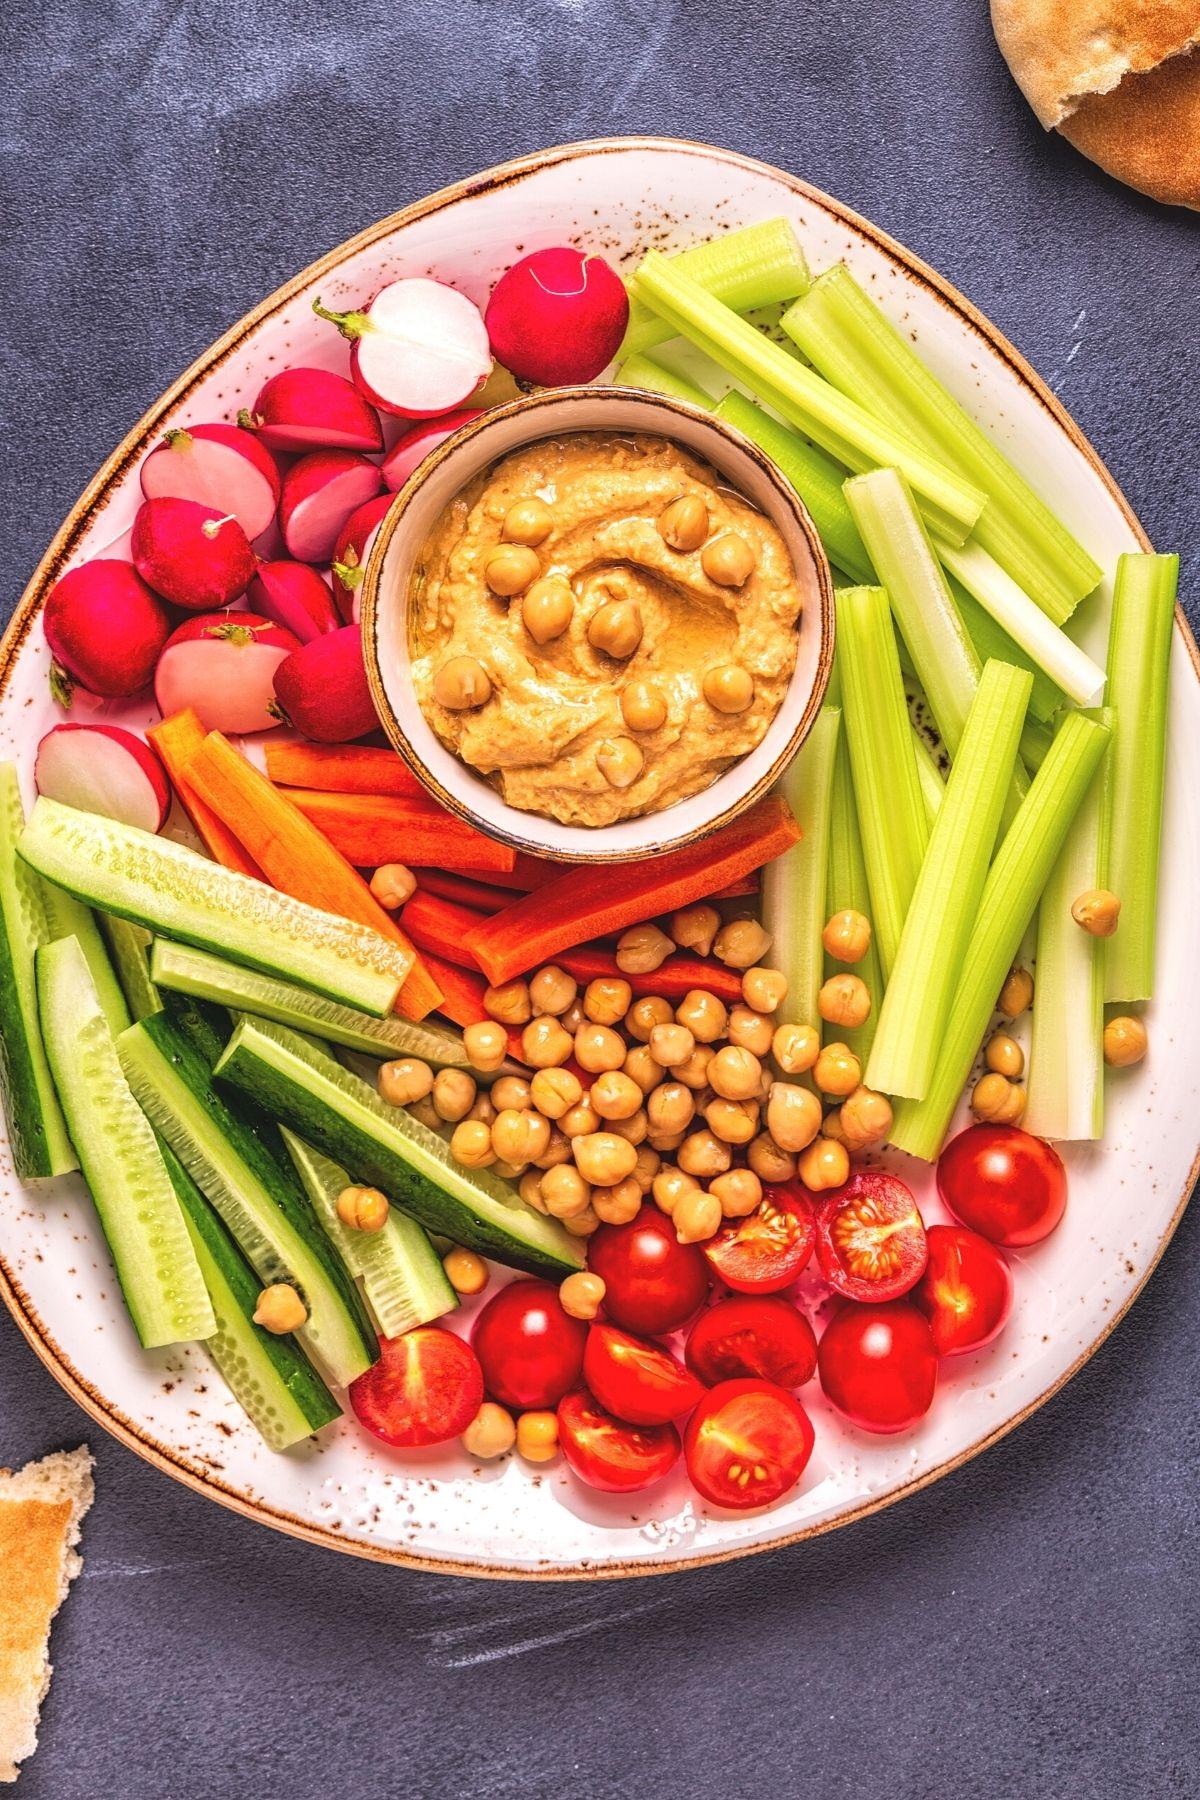 photo with platter of hummus and veggies